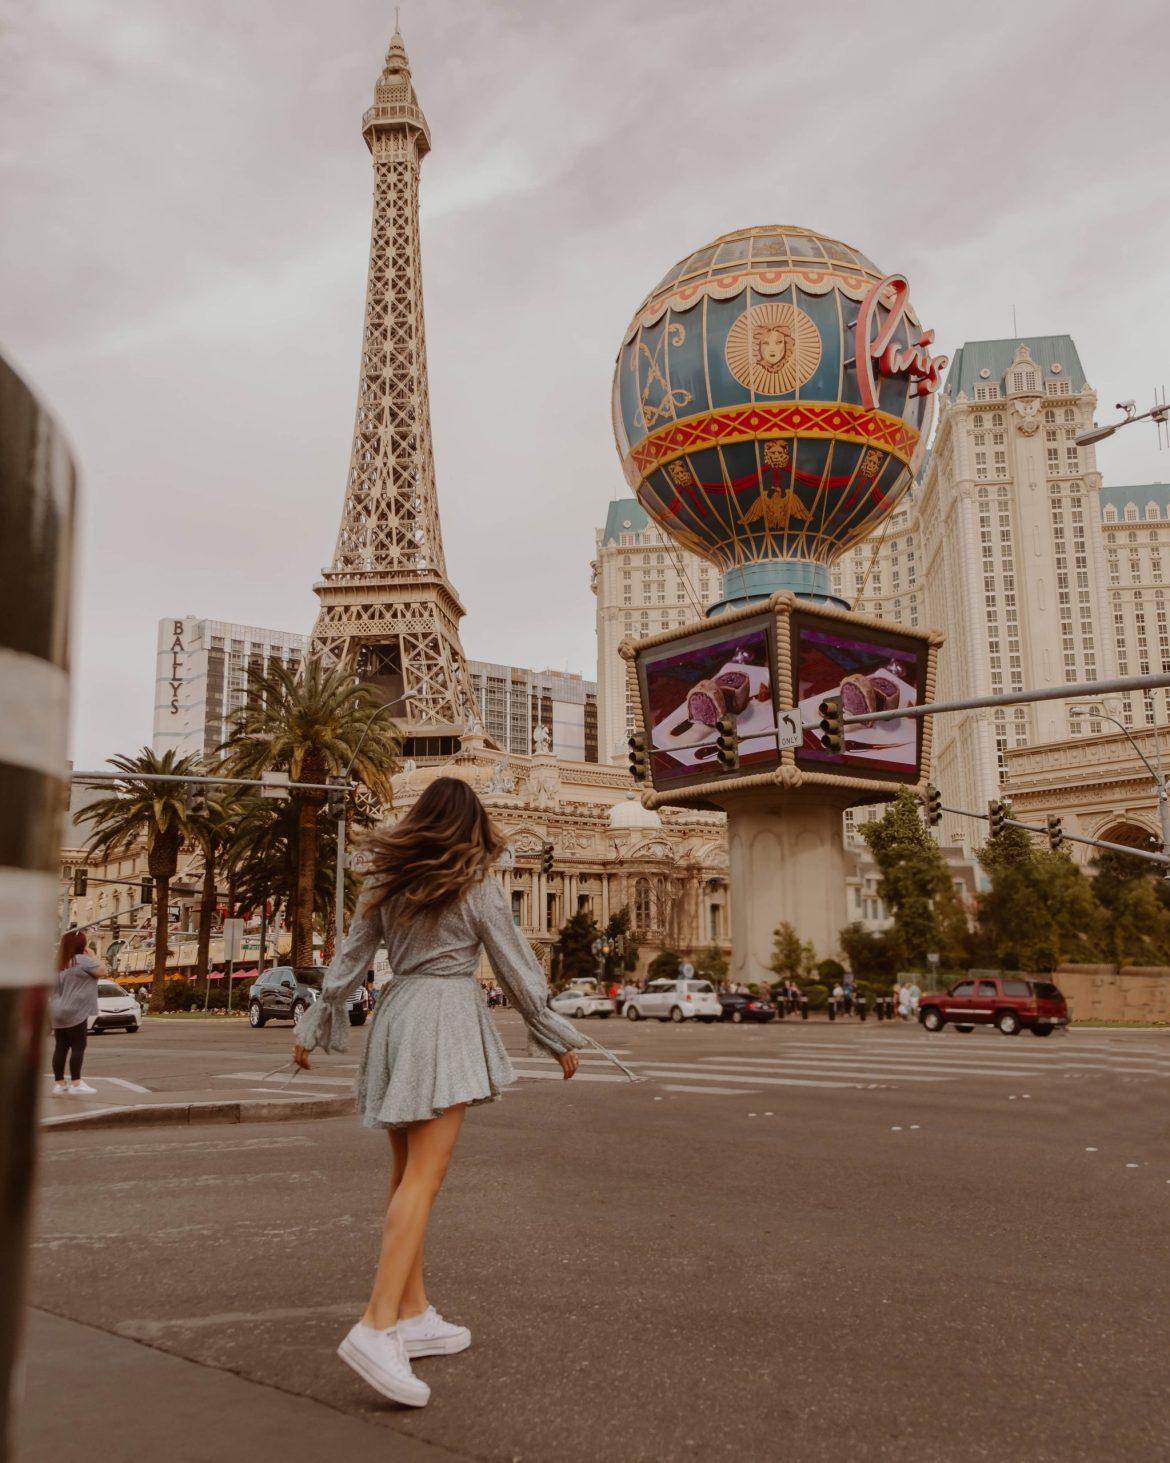 Las Vegas Eiffel Tower - Nevada & Arizona road trip guide and itinerary